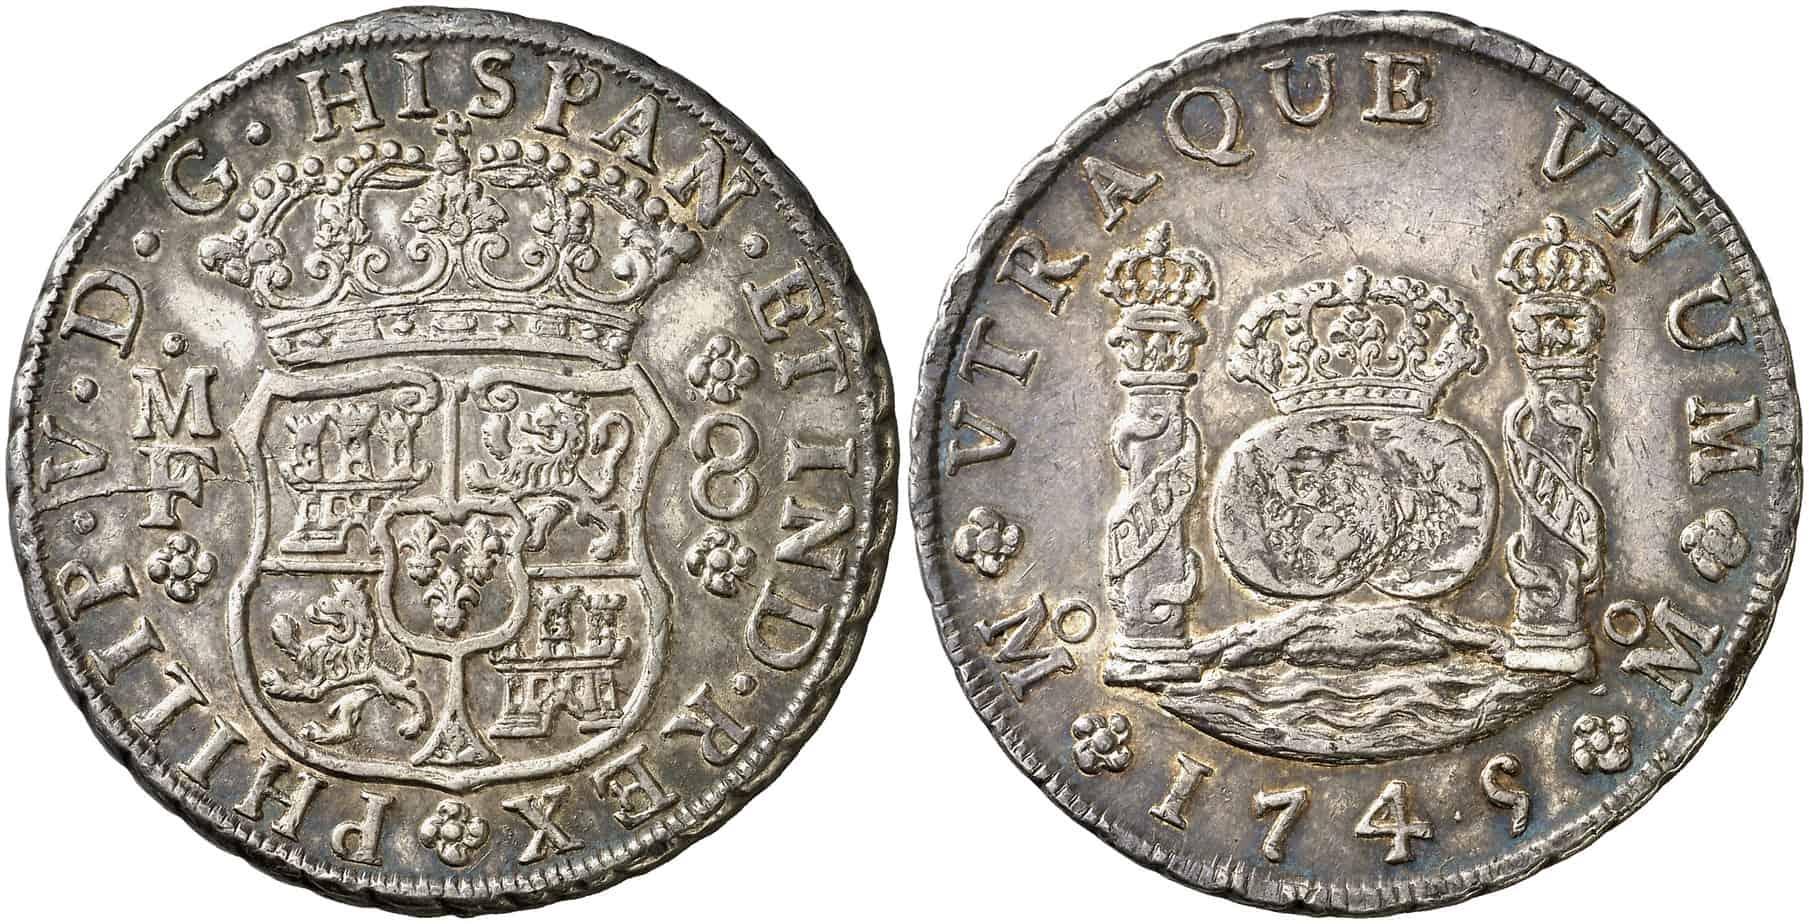 8 reales de México de 1745. Subastado por Áureo & Calicó en marzo de 2016.